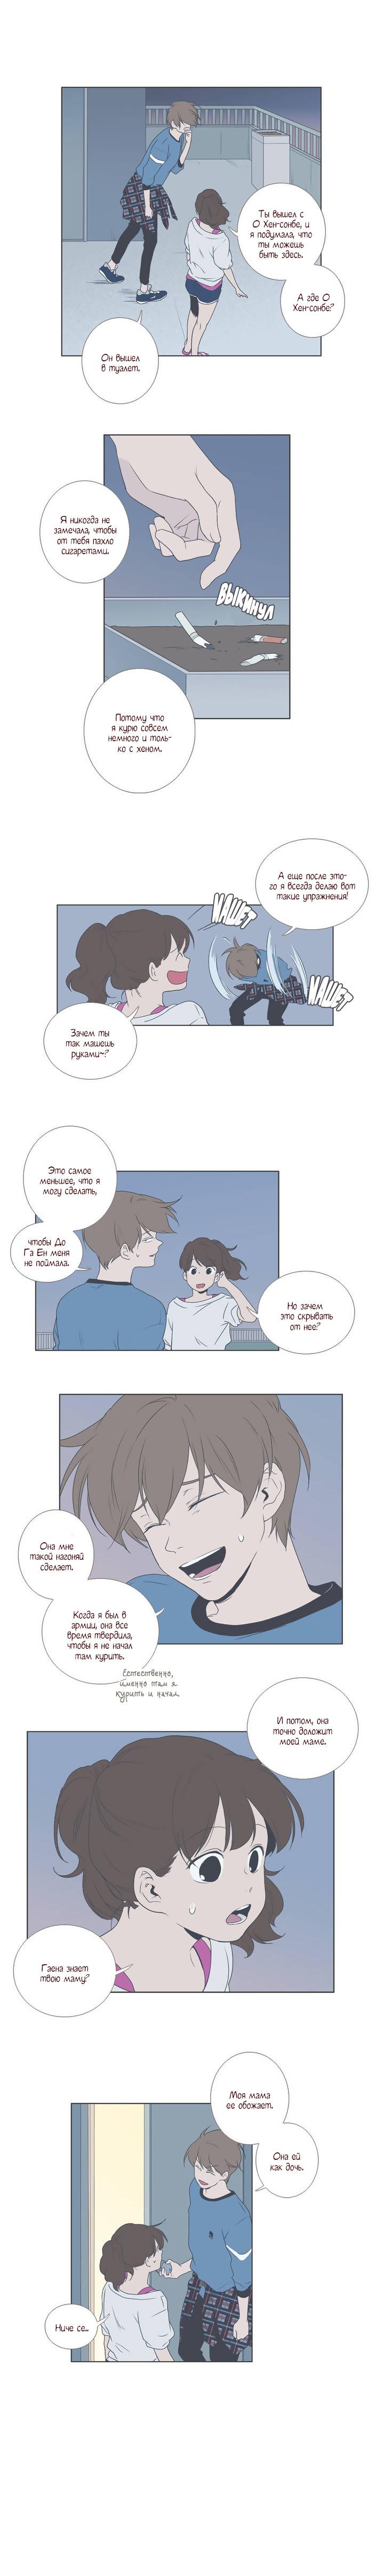 https://r1.ninemanga.com/comics/pic2/12/22860/316659/1484809972961.jpg Page 7